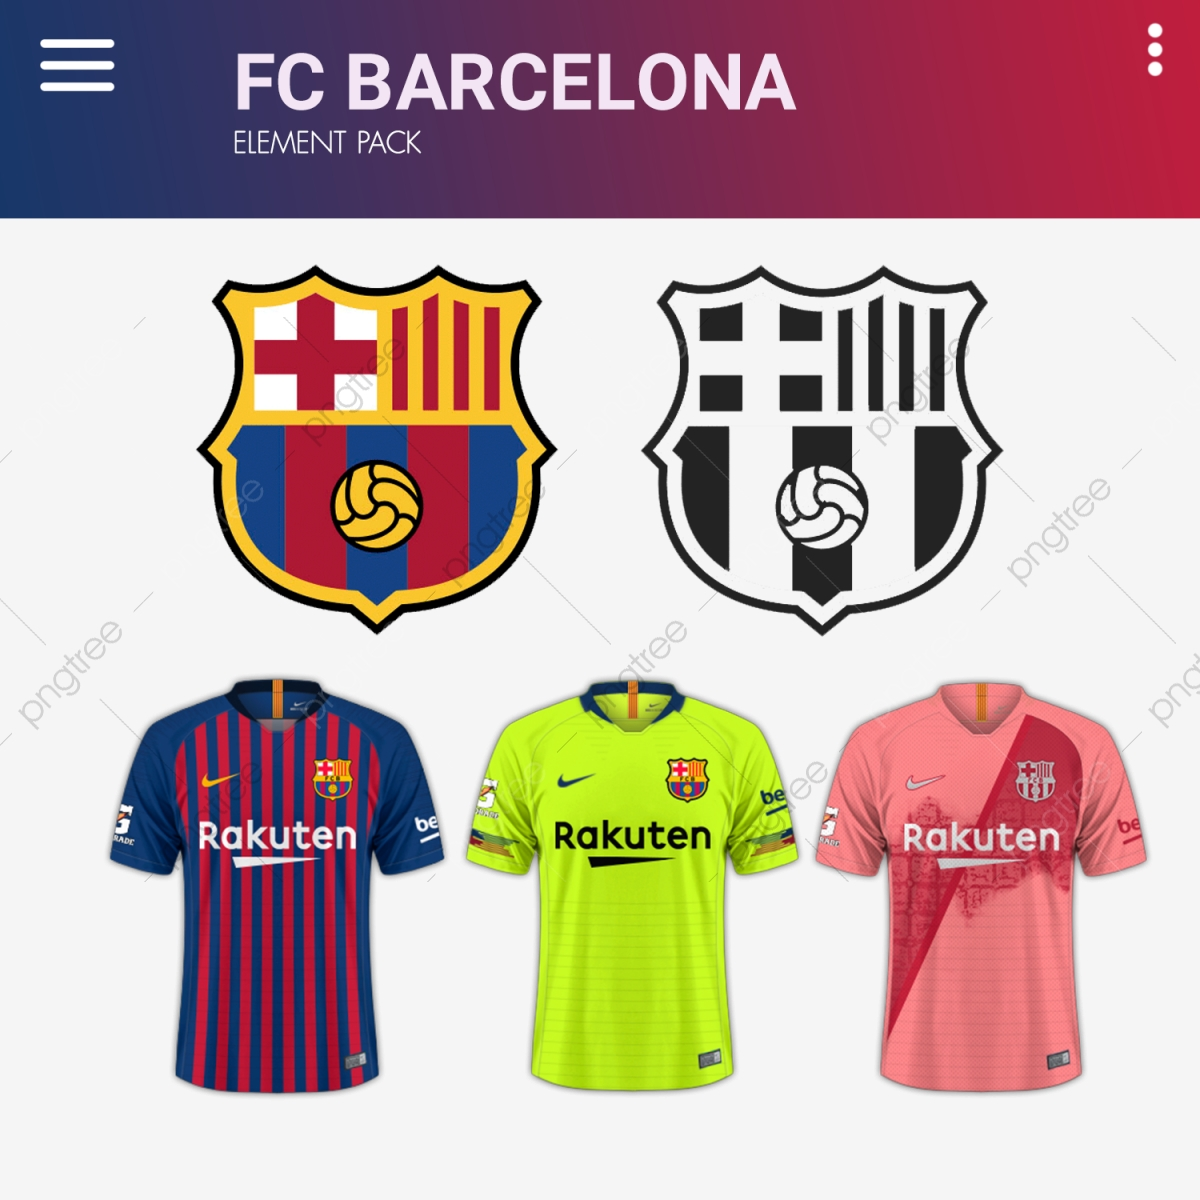 FC Bacelona Football Club Graphic Elements, Football Club, Fc.